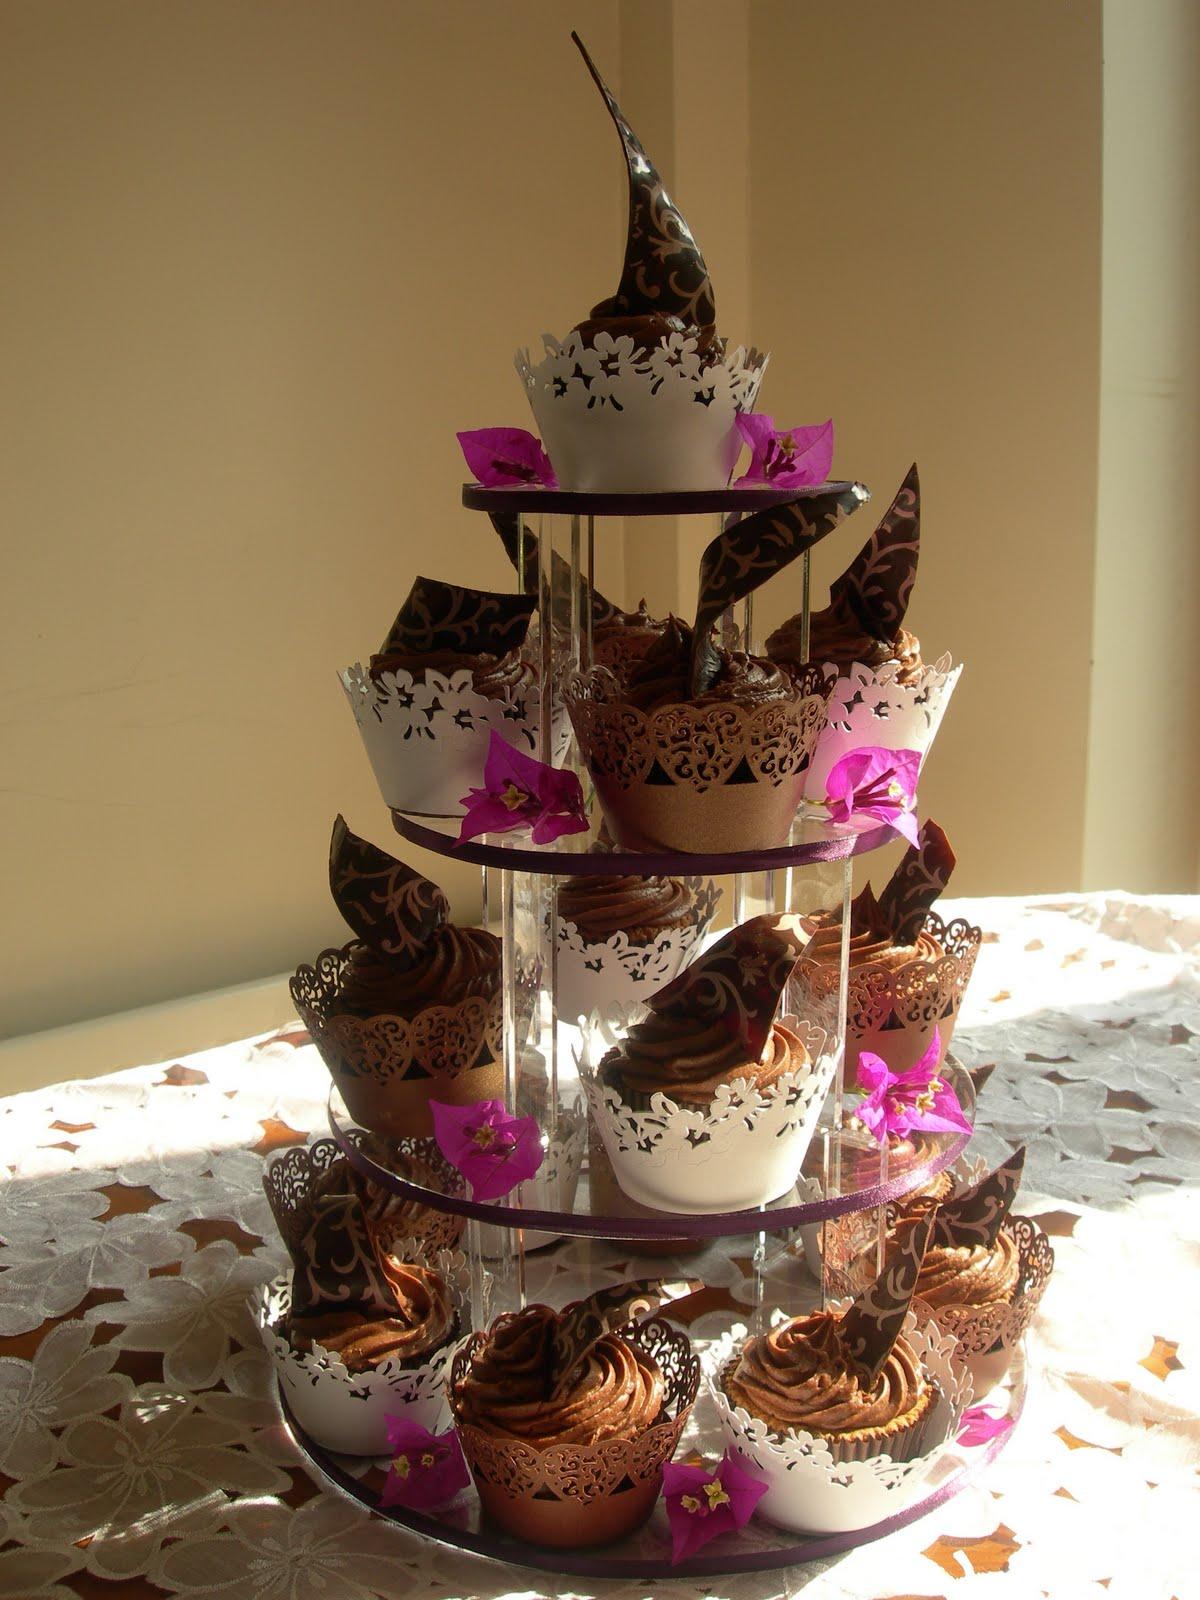 Custom Cake Designs Uk : Custom Cake Design: Chocolate Swirl Tower